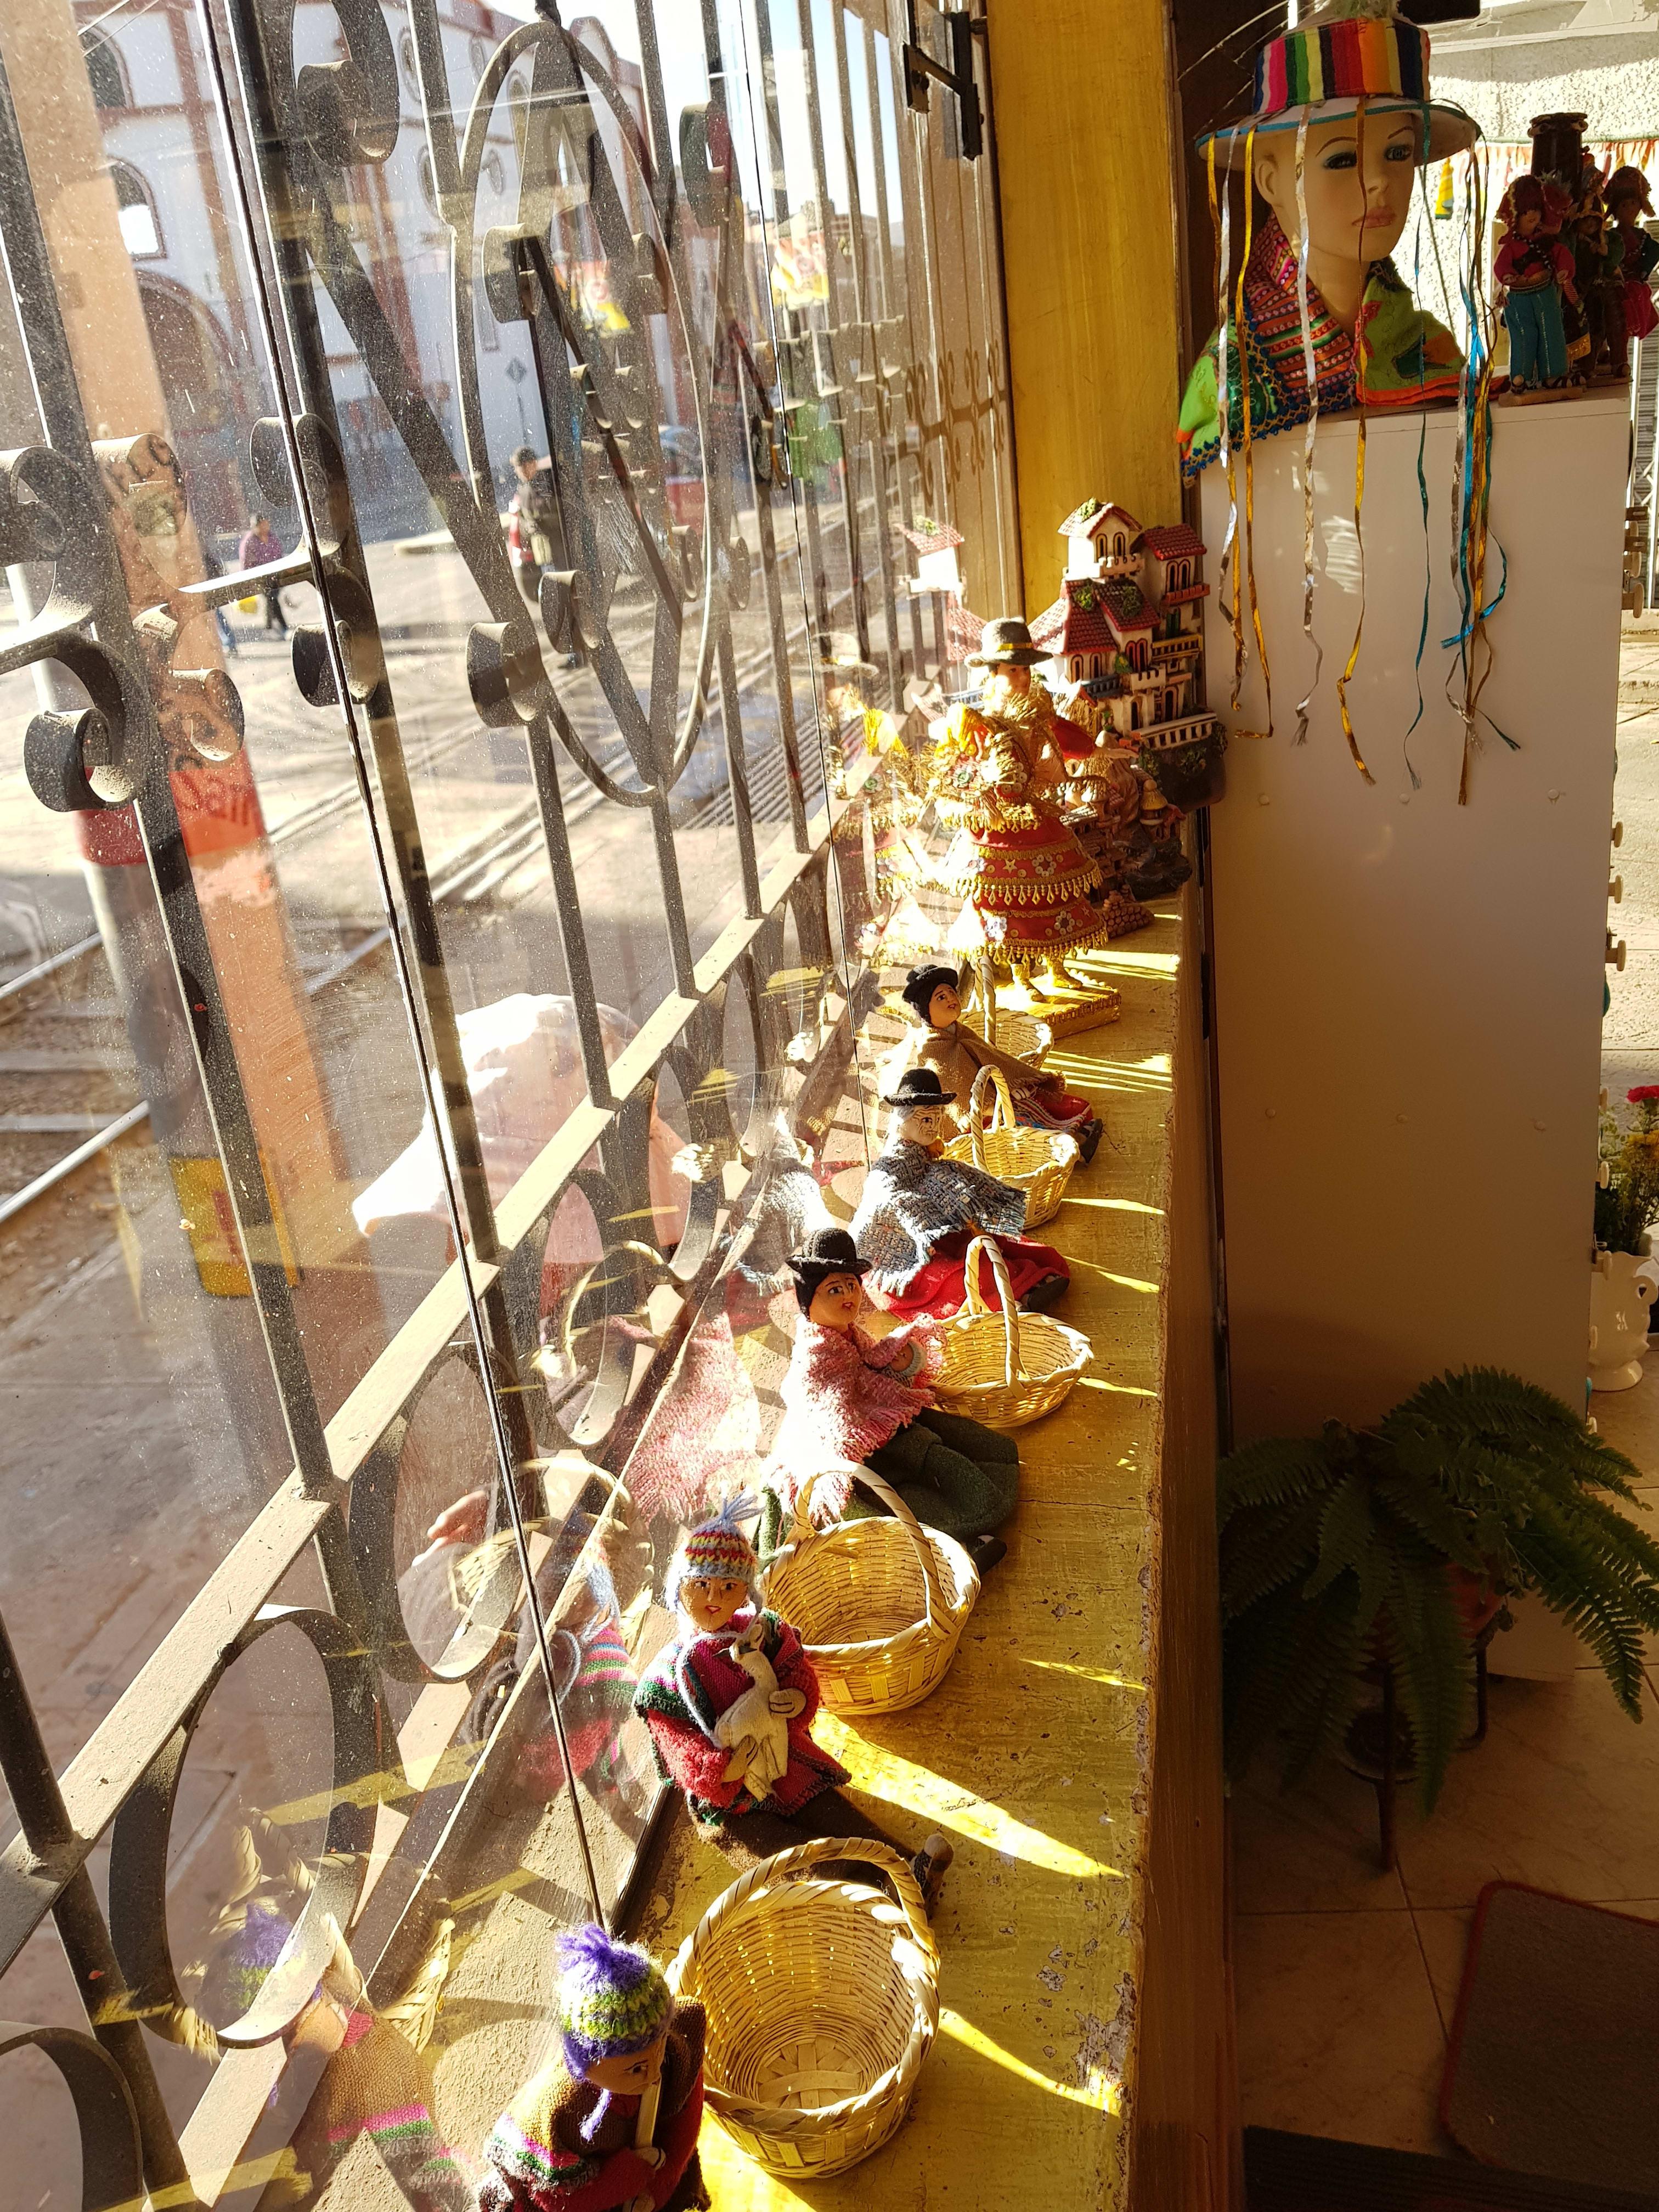 HOSTEL - Cozy Hostel Puno